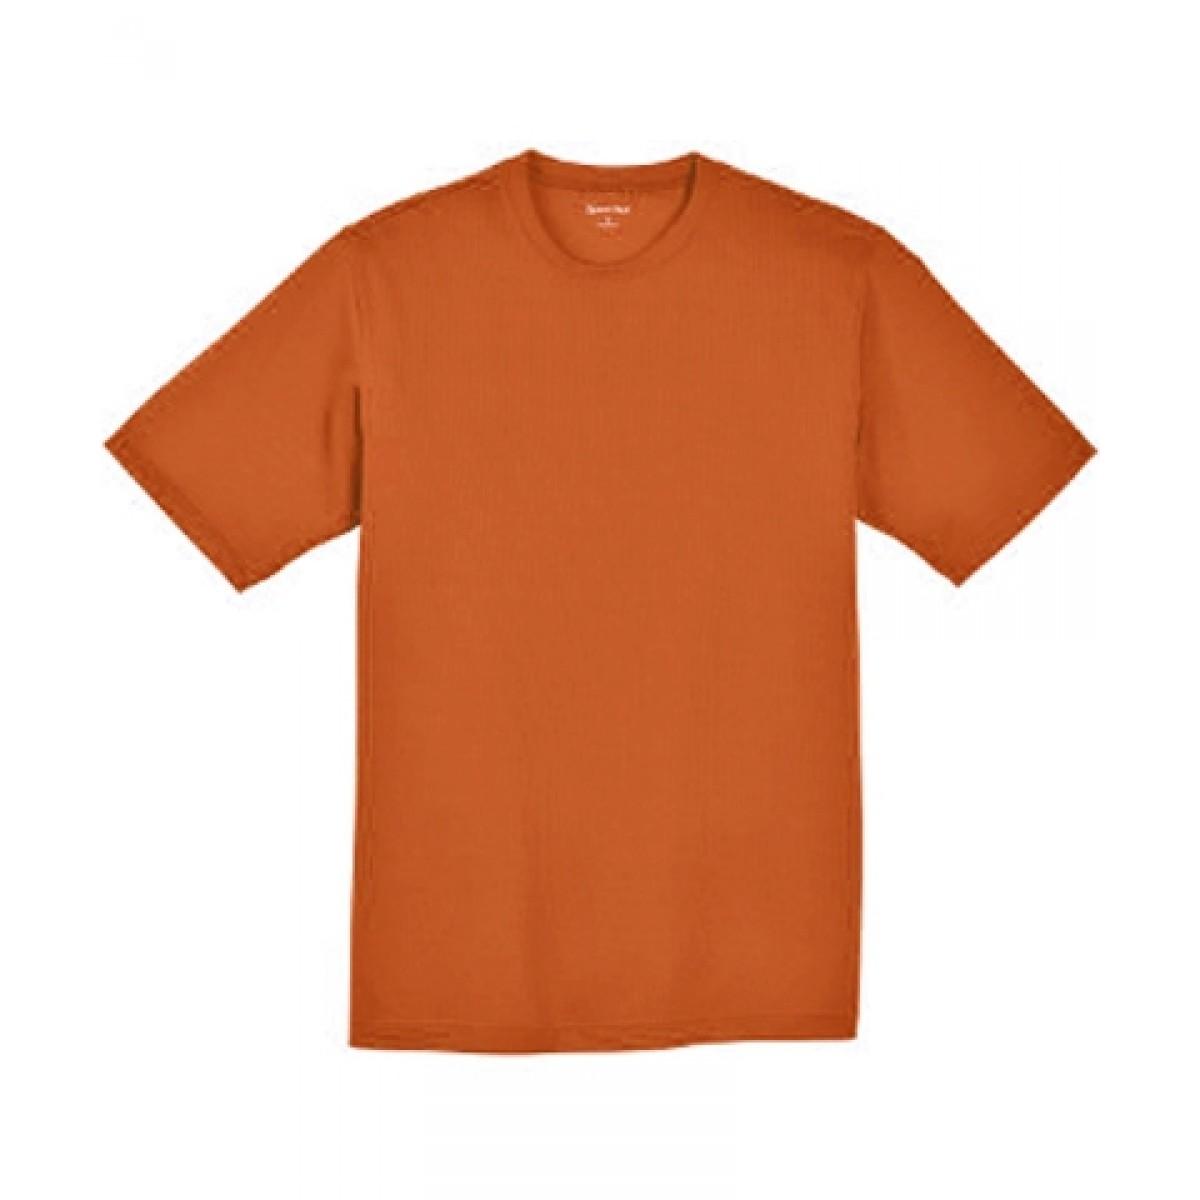 CLOSEOUT!!! SS Dri-Fit Tees-Orange-S